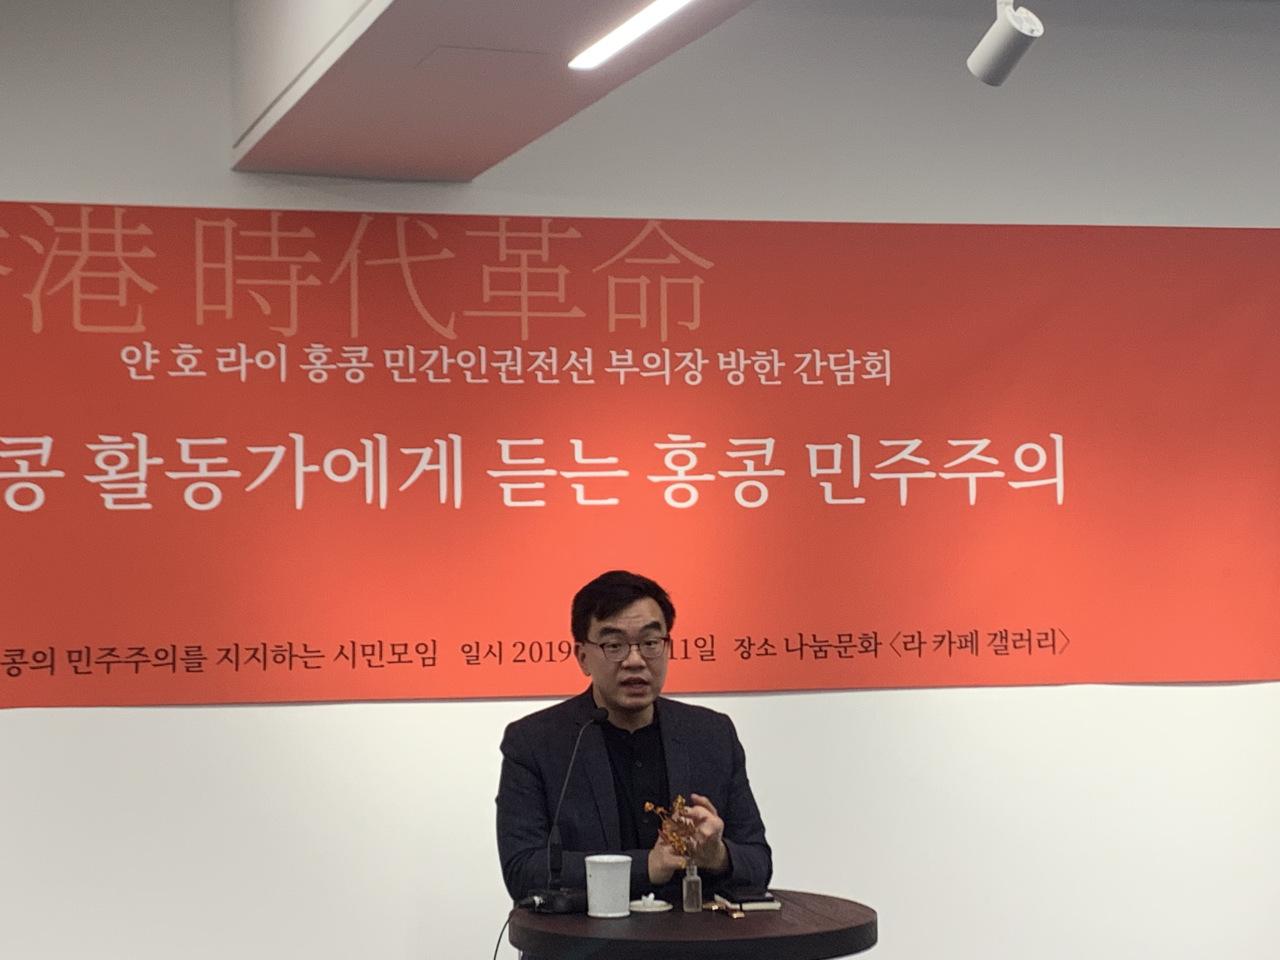 Democratic activist Lai Yan-ho speaks during a press conference on Monday in Jongno, Seoul. (Kim Arin/The Korea Herald)